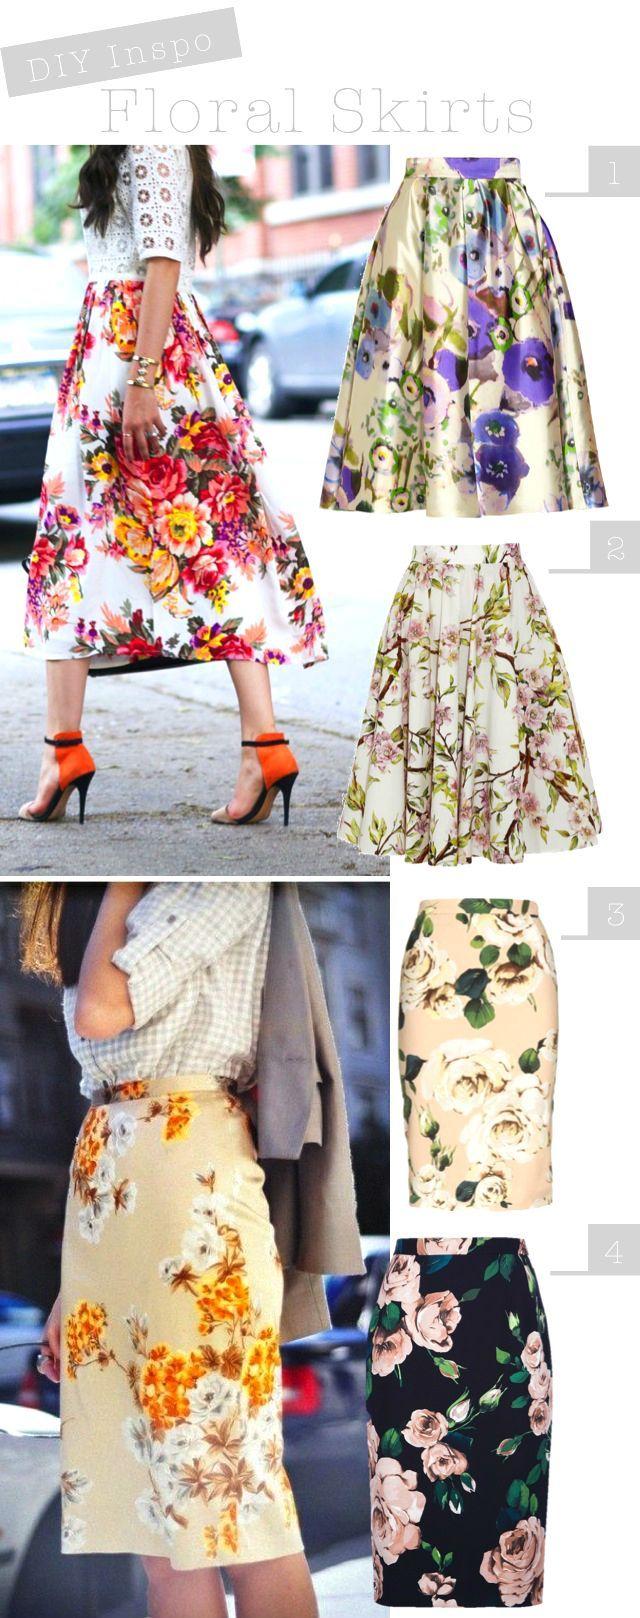 DIY Inspo: Floral Skirts - Faldas con estampado de flores (scheduled via http://www.tailwindapp.com?utm_source=pinterest&utm_medium=twpin&utm_content=post19109276&utm_campaign=scheduler_attribution)